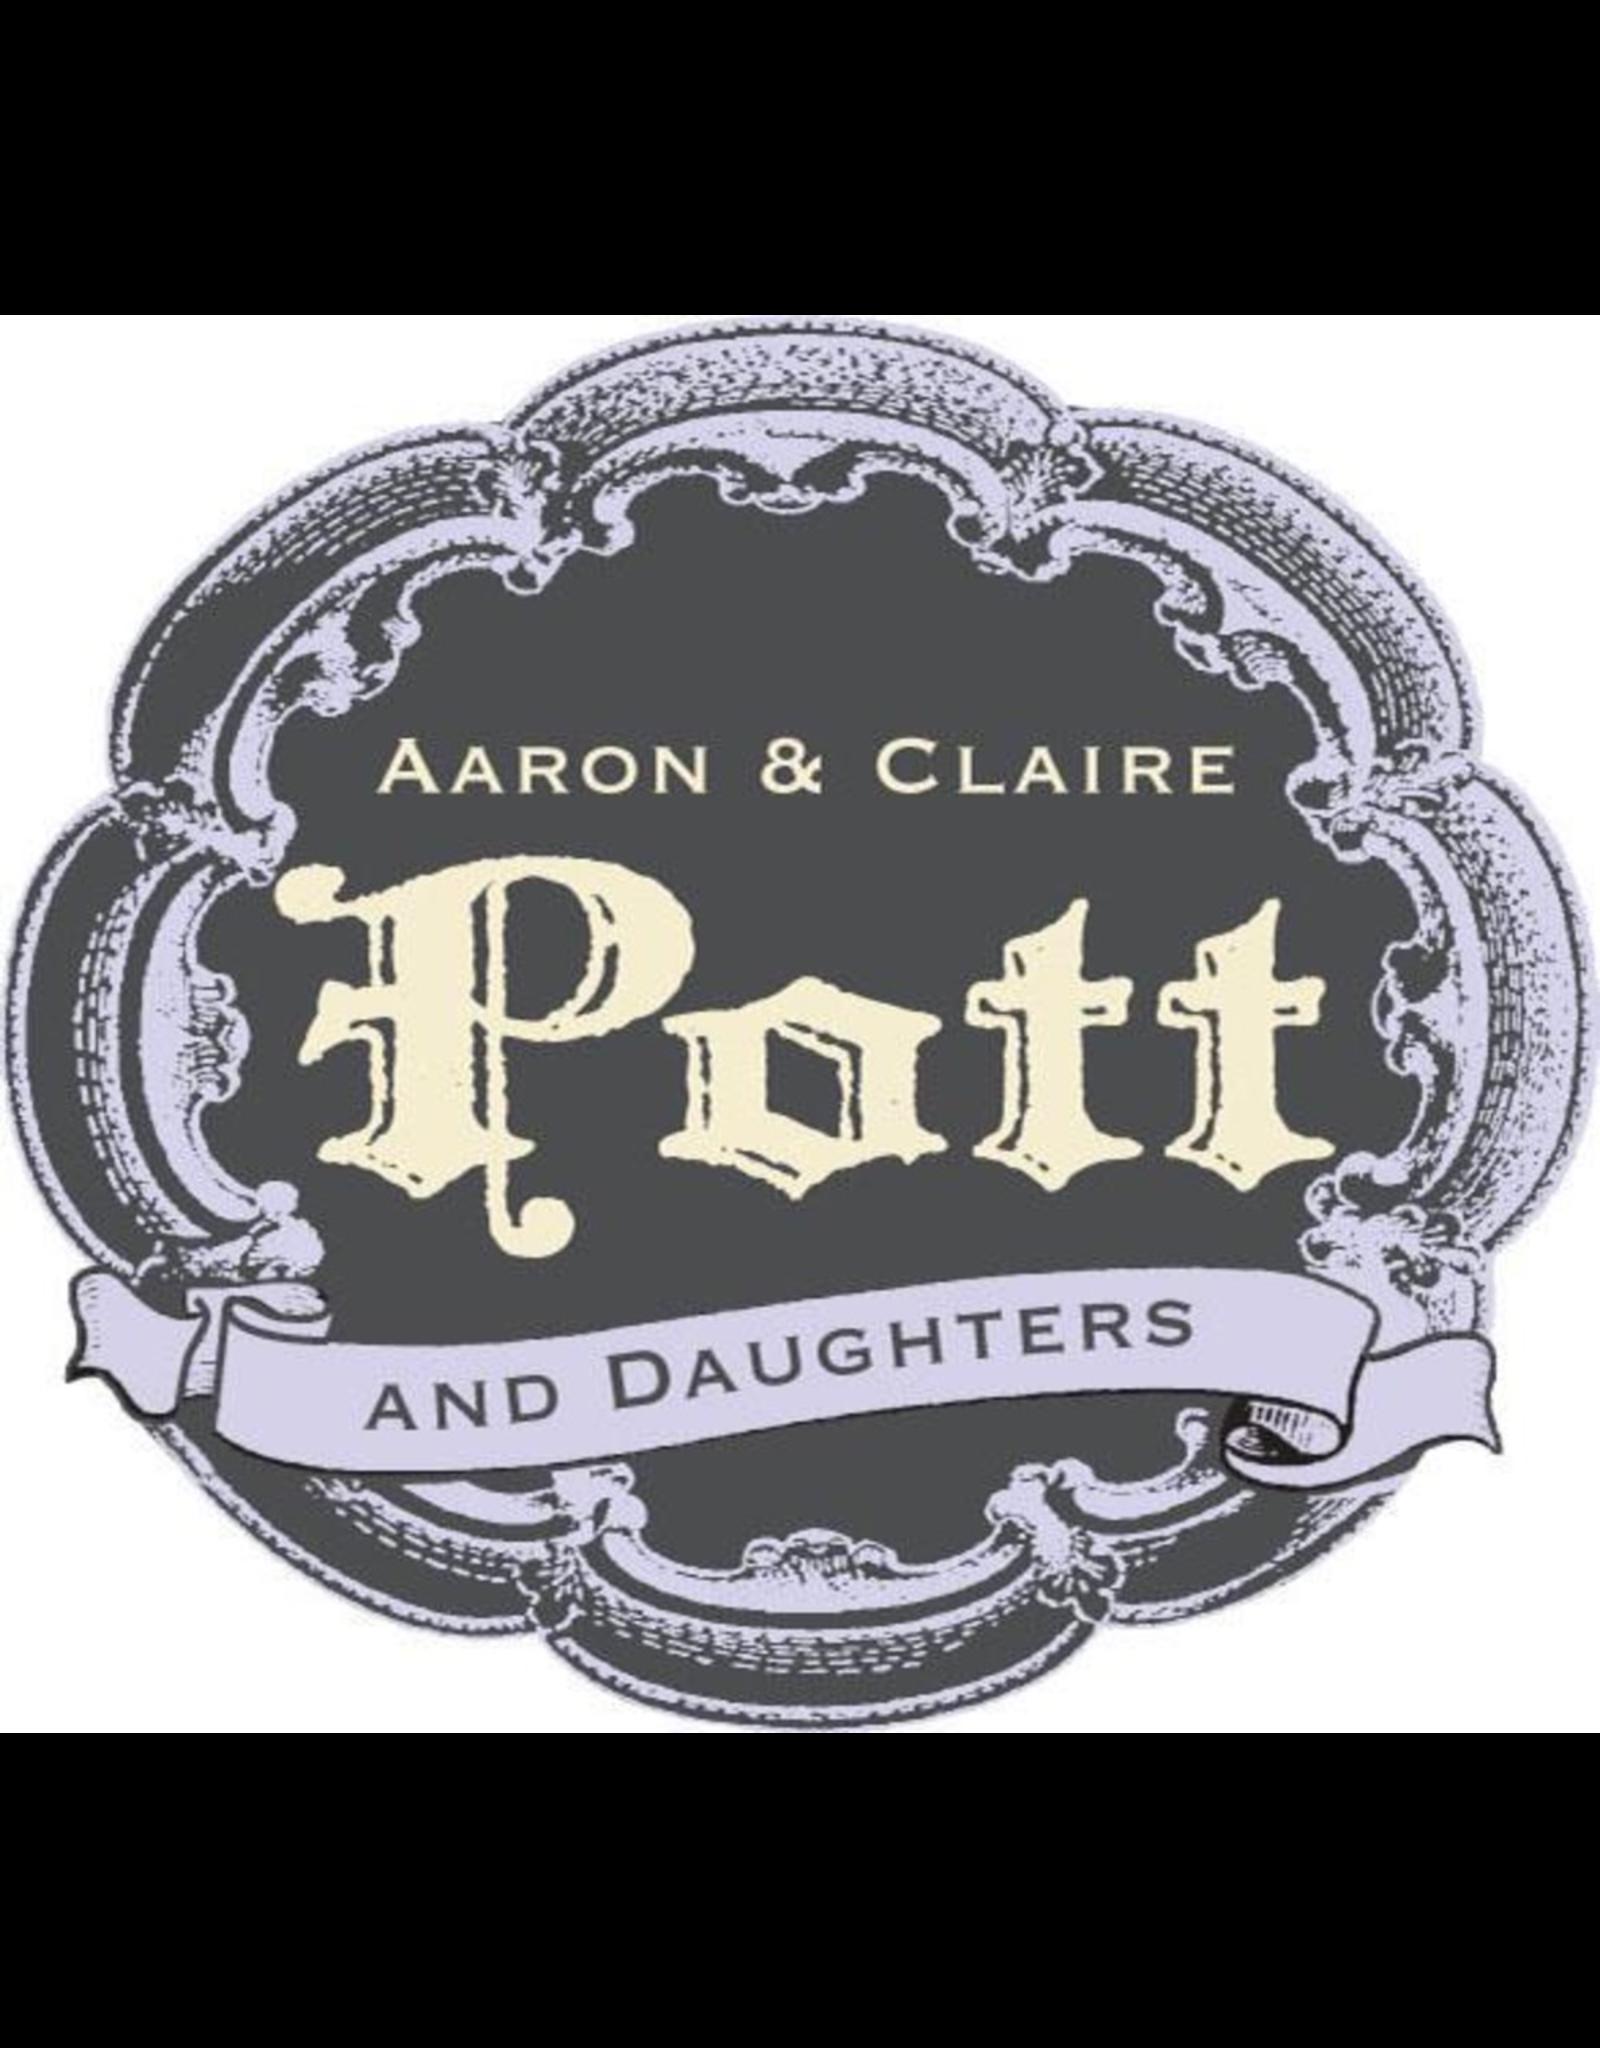 Red Wine 2017, Aaron Pott, Cabernet Sauvignon, Napa Valley, Napa, California, 14.7% Alc, CTnr